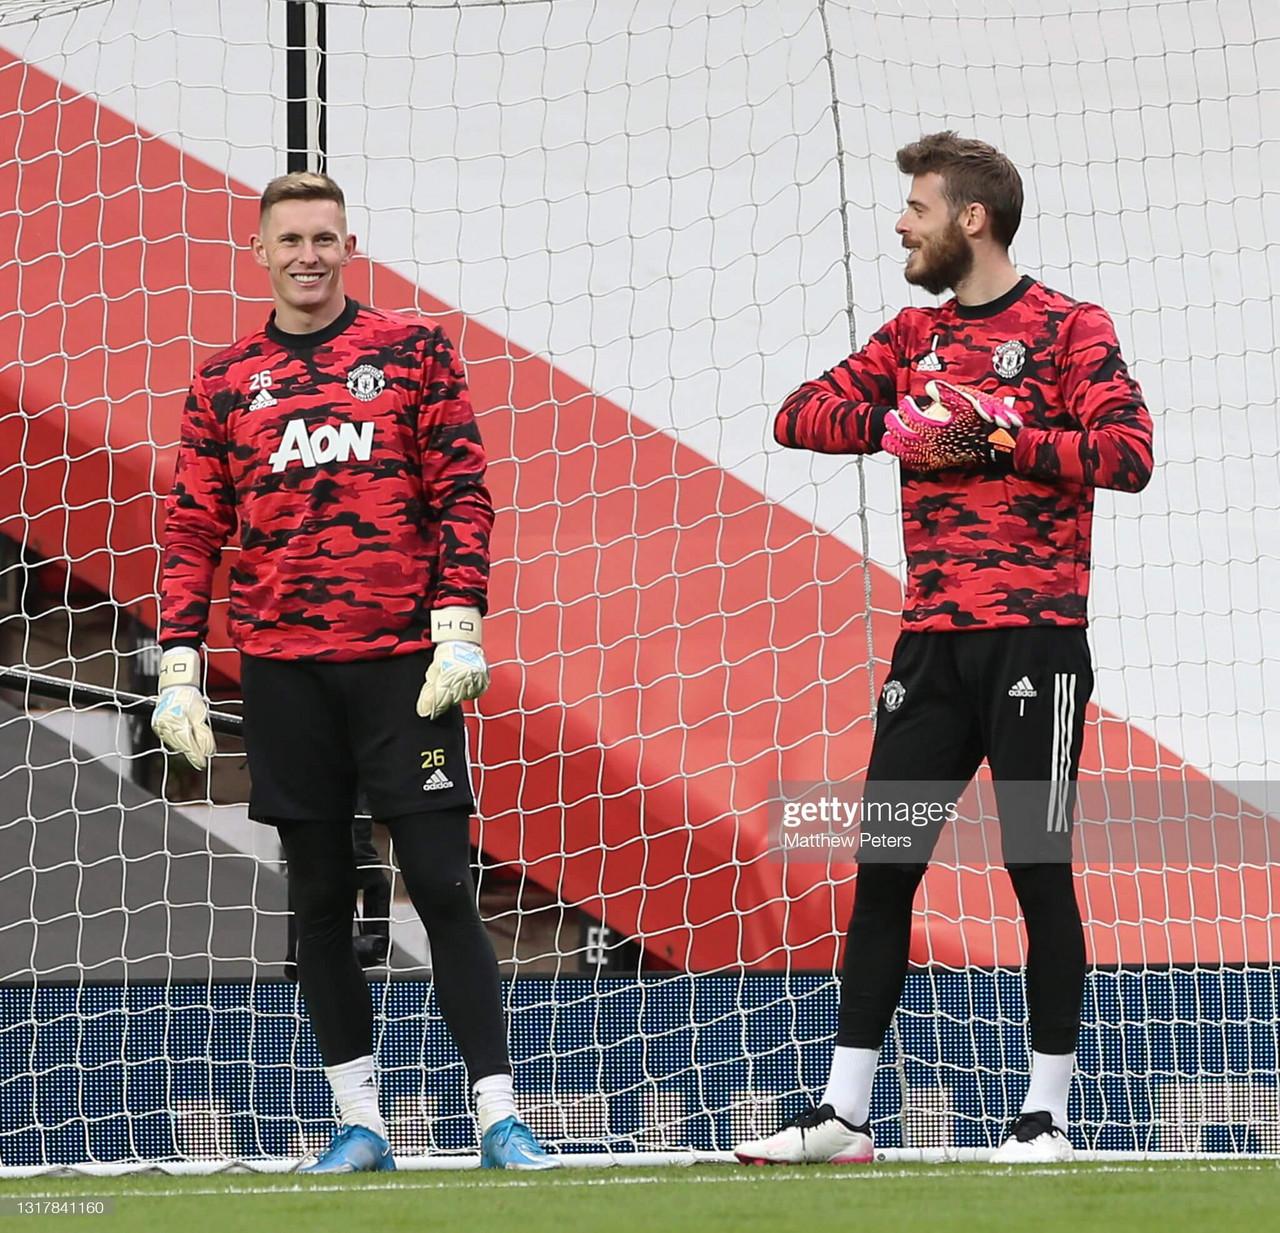 David De Gea or Dean Henderson: Two goalkeepers fighting for one spot